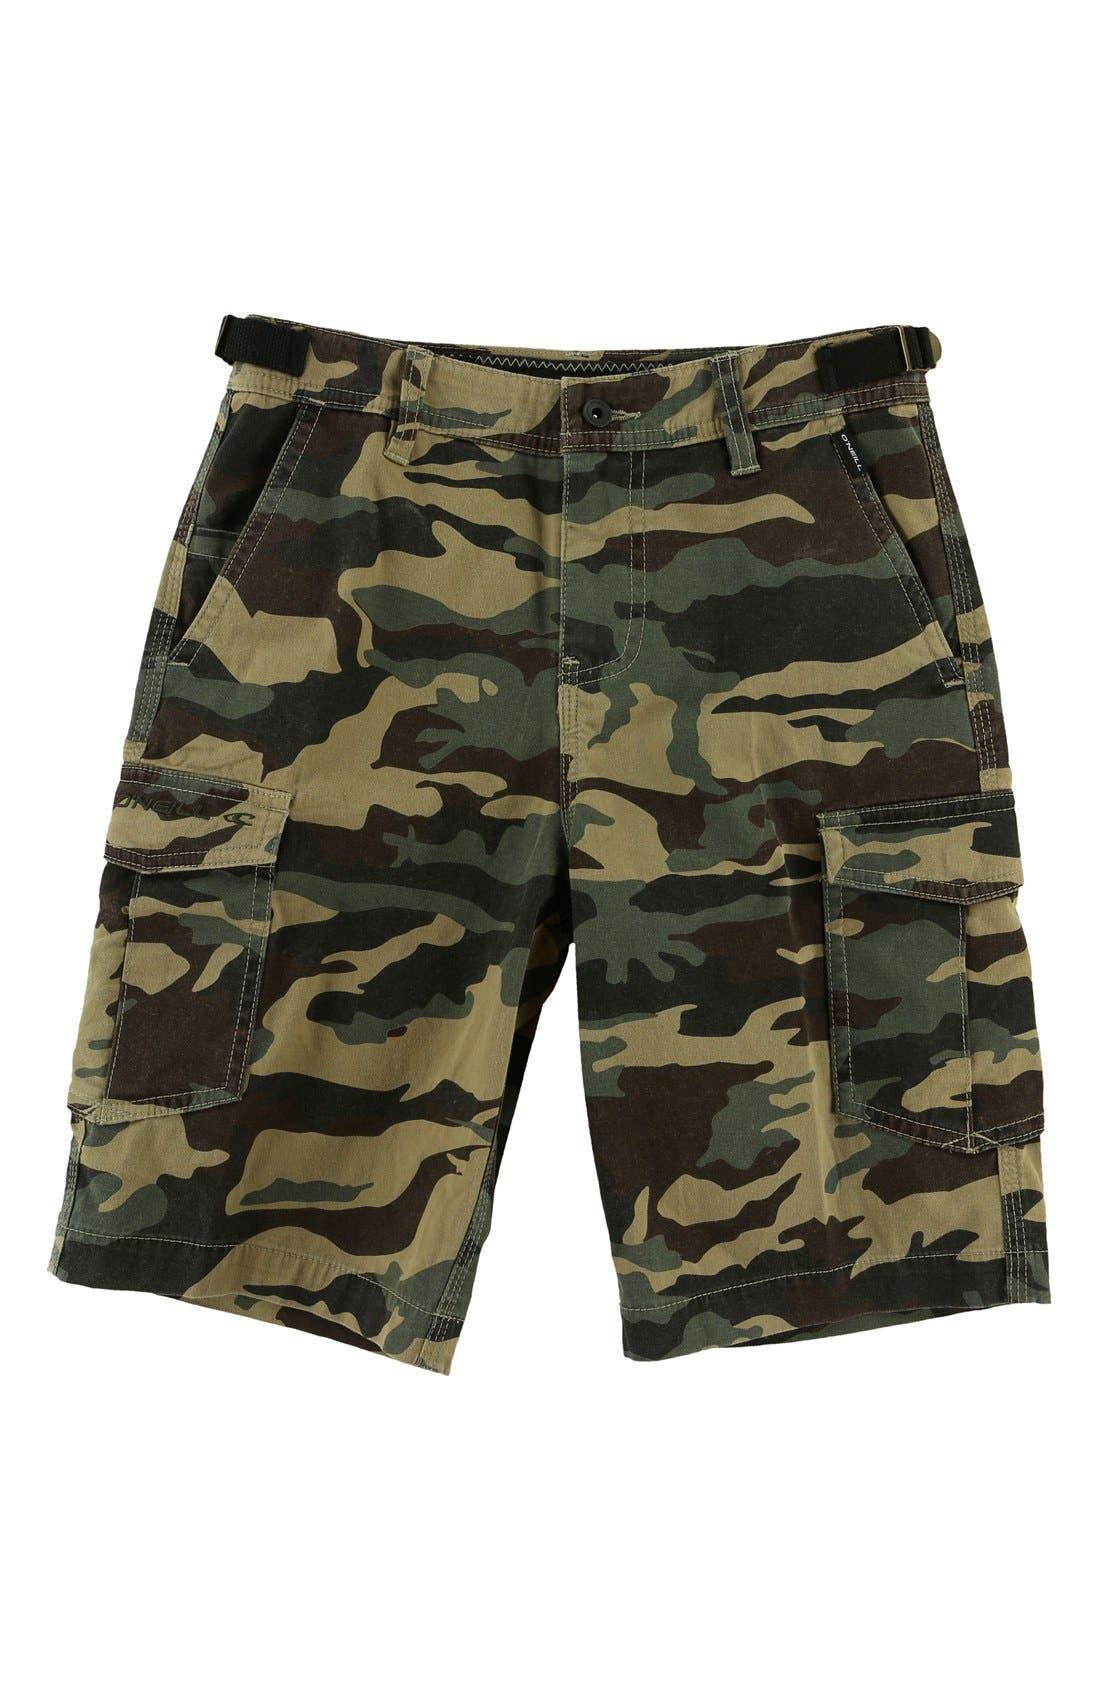 Alternate Image 1 Selected - O'Neill El Toro Cargo Shorts (Big Boys)